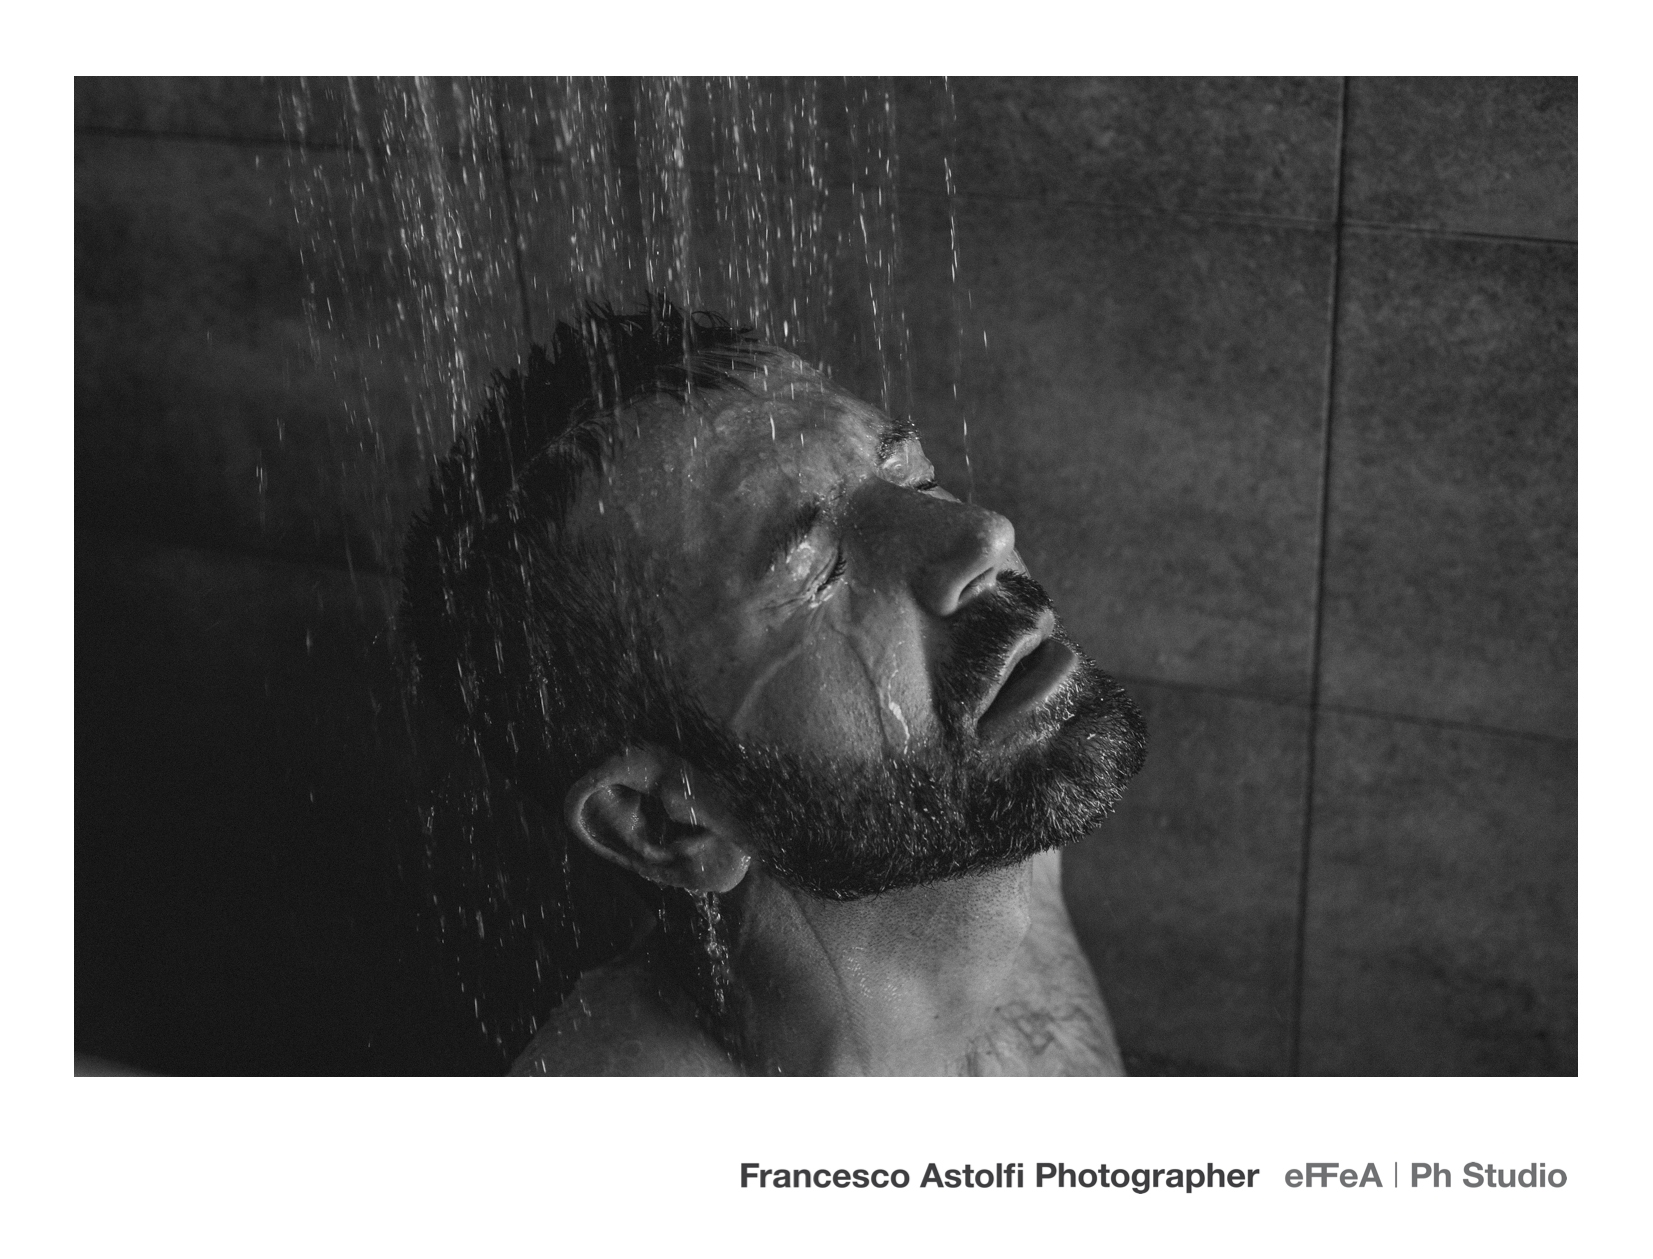 007 - ANDREA S. - Photo by Francesco Astolfi